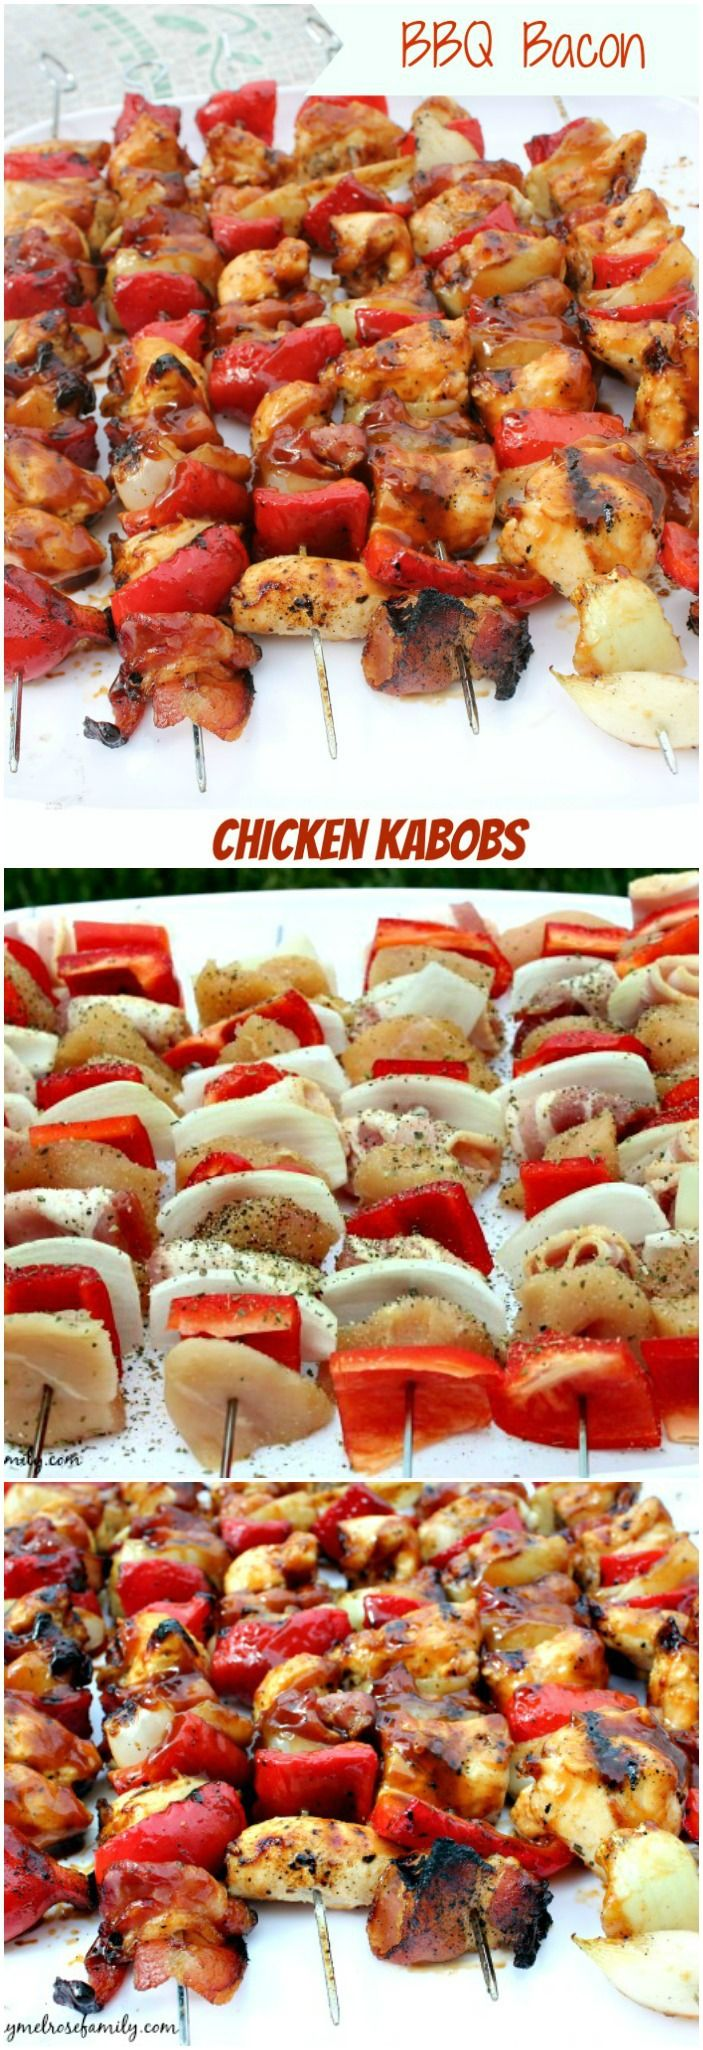 BBQ BACON Chicken Kabobs